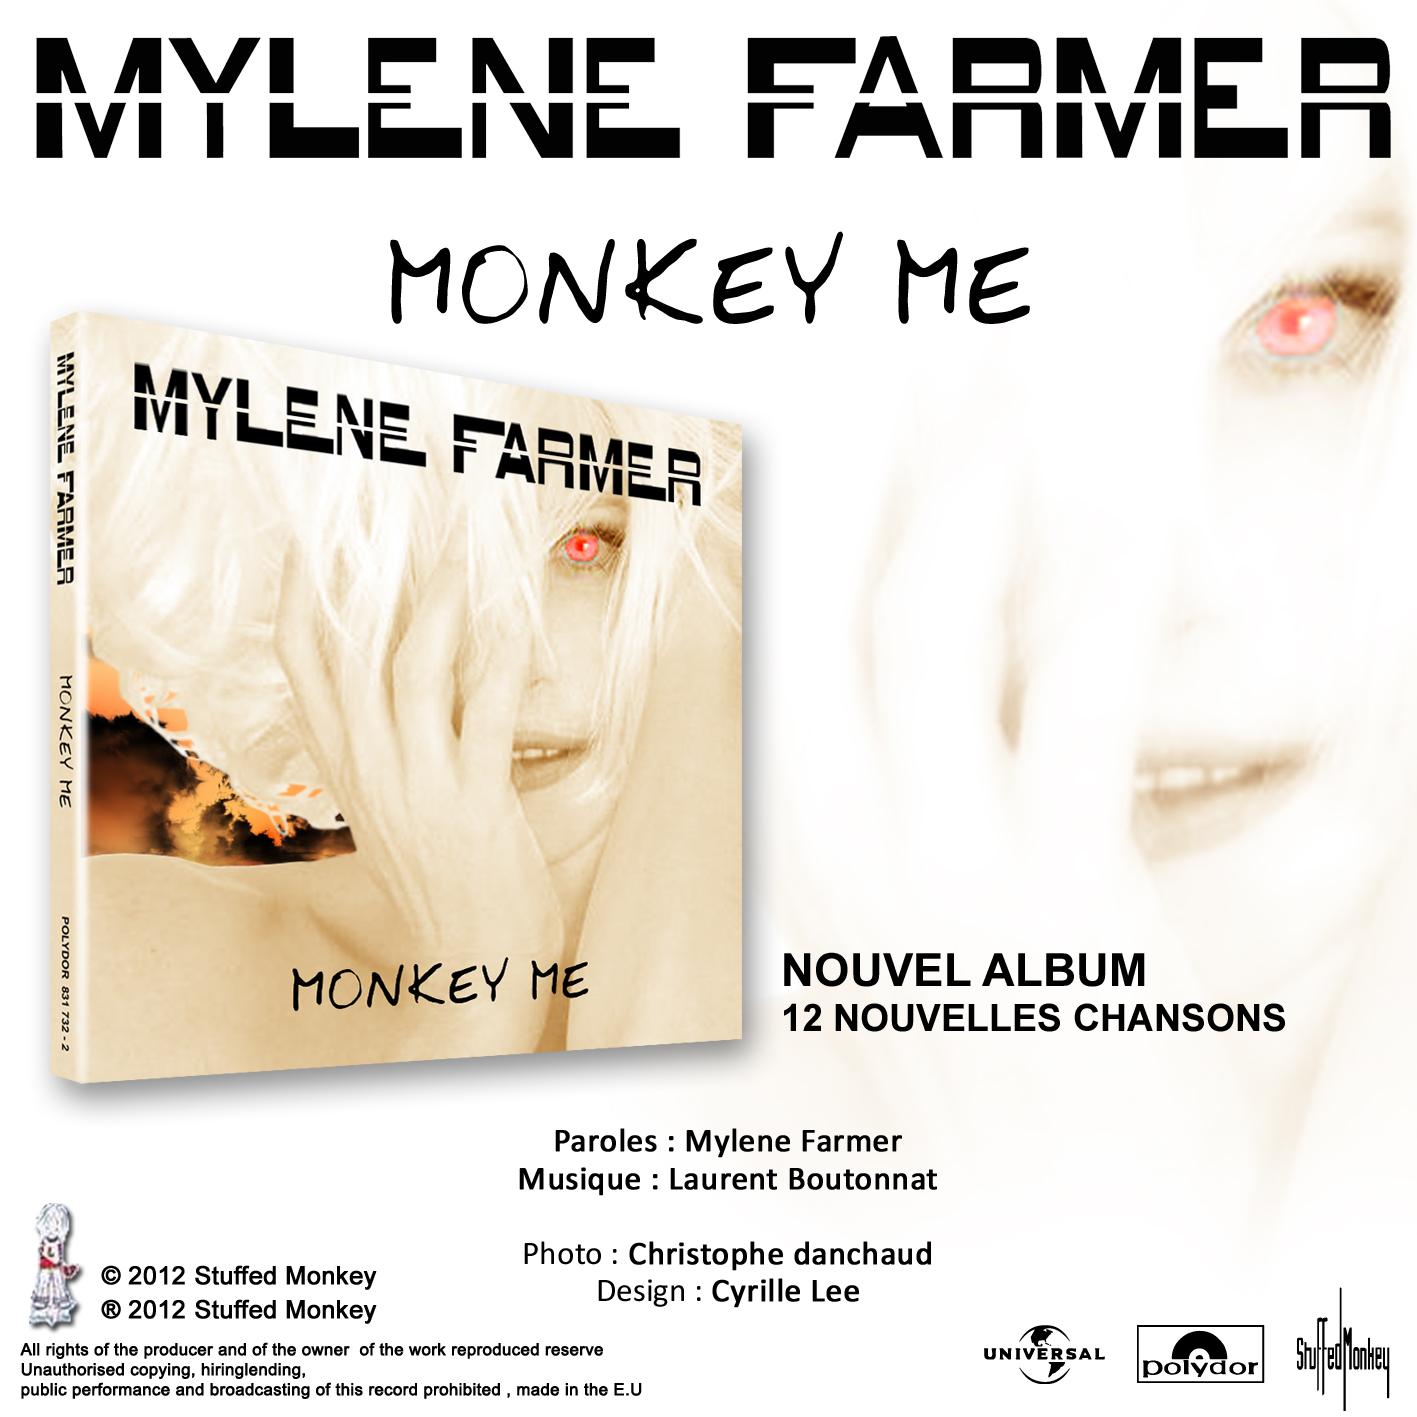 http://3.bp.blogspot.com/-uV0B6nQdYI8/UGm_8Pv97aI/AAAAAAAABR4/eTjGcgLfLDY/s1600/affiche+Monkey+Me.jpg